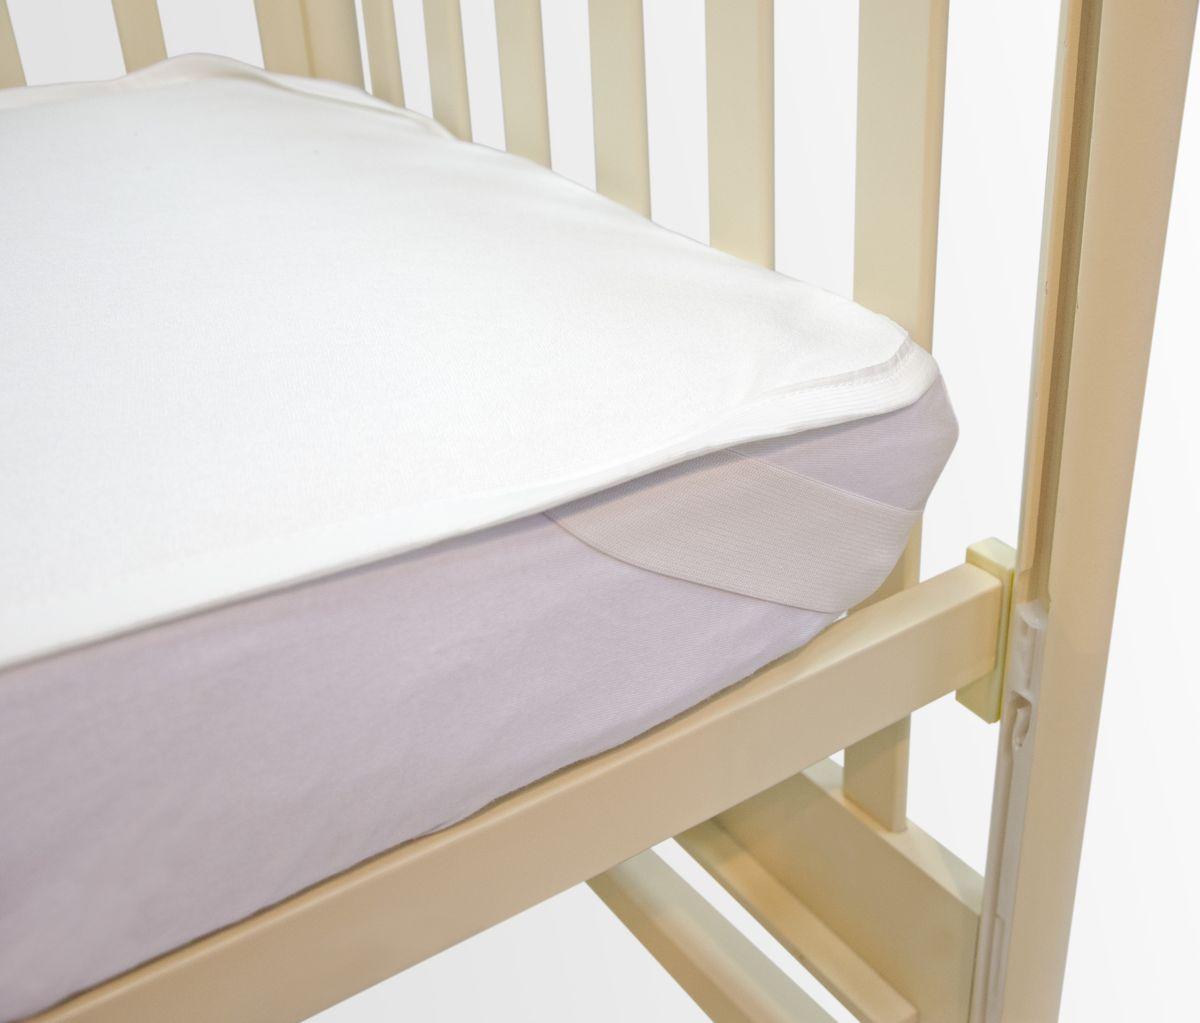 OL-Tex Наматрасник детский непромокаемый цвет белый 60 х 120 см sweet baby наматрасник непромокаемый sb k013